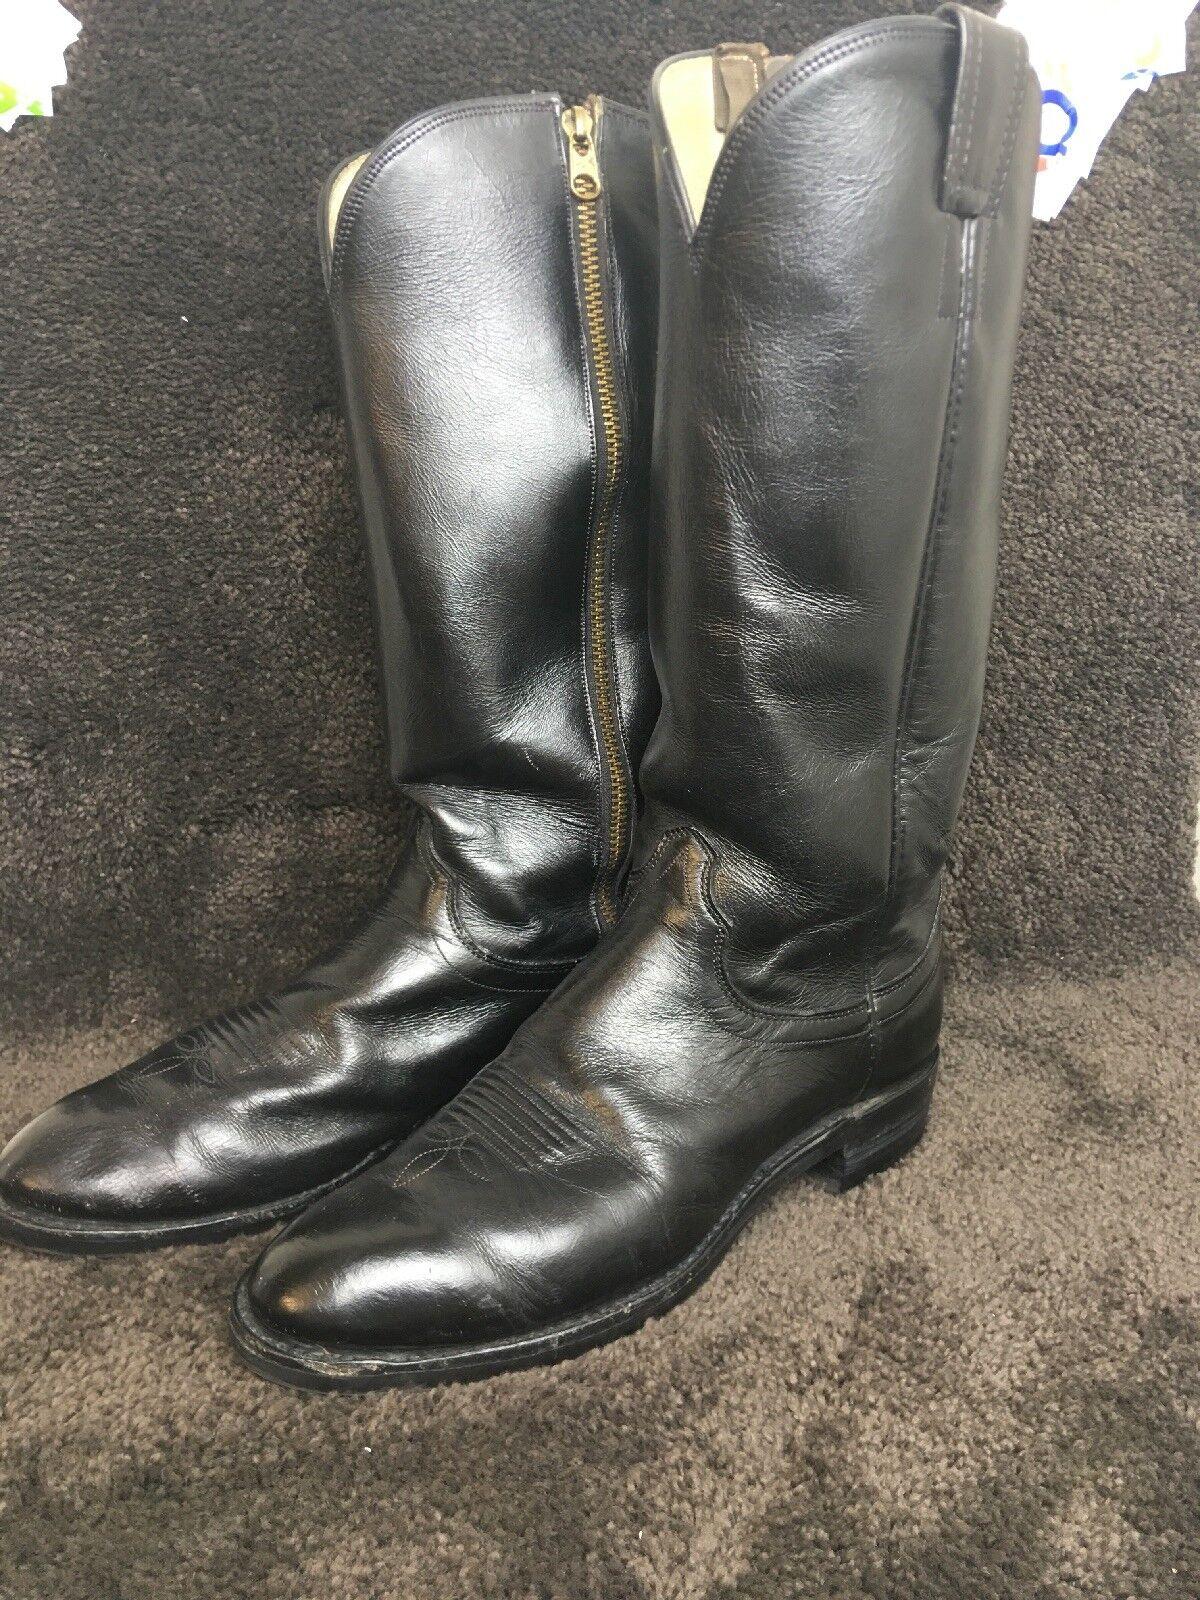 Vintage Olas the stivali Zide Talon Zip Vibram Soles  Tall Mid Calf Mens 8.5 B NARROW  consegna rapida